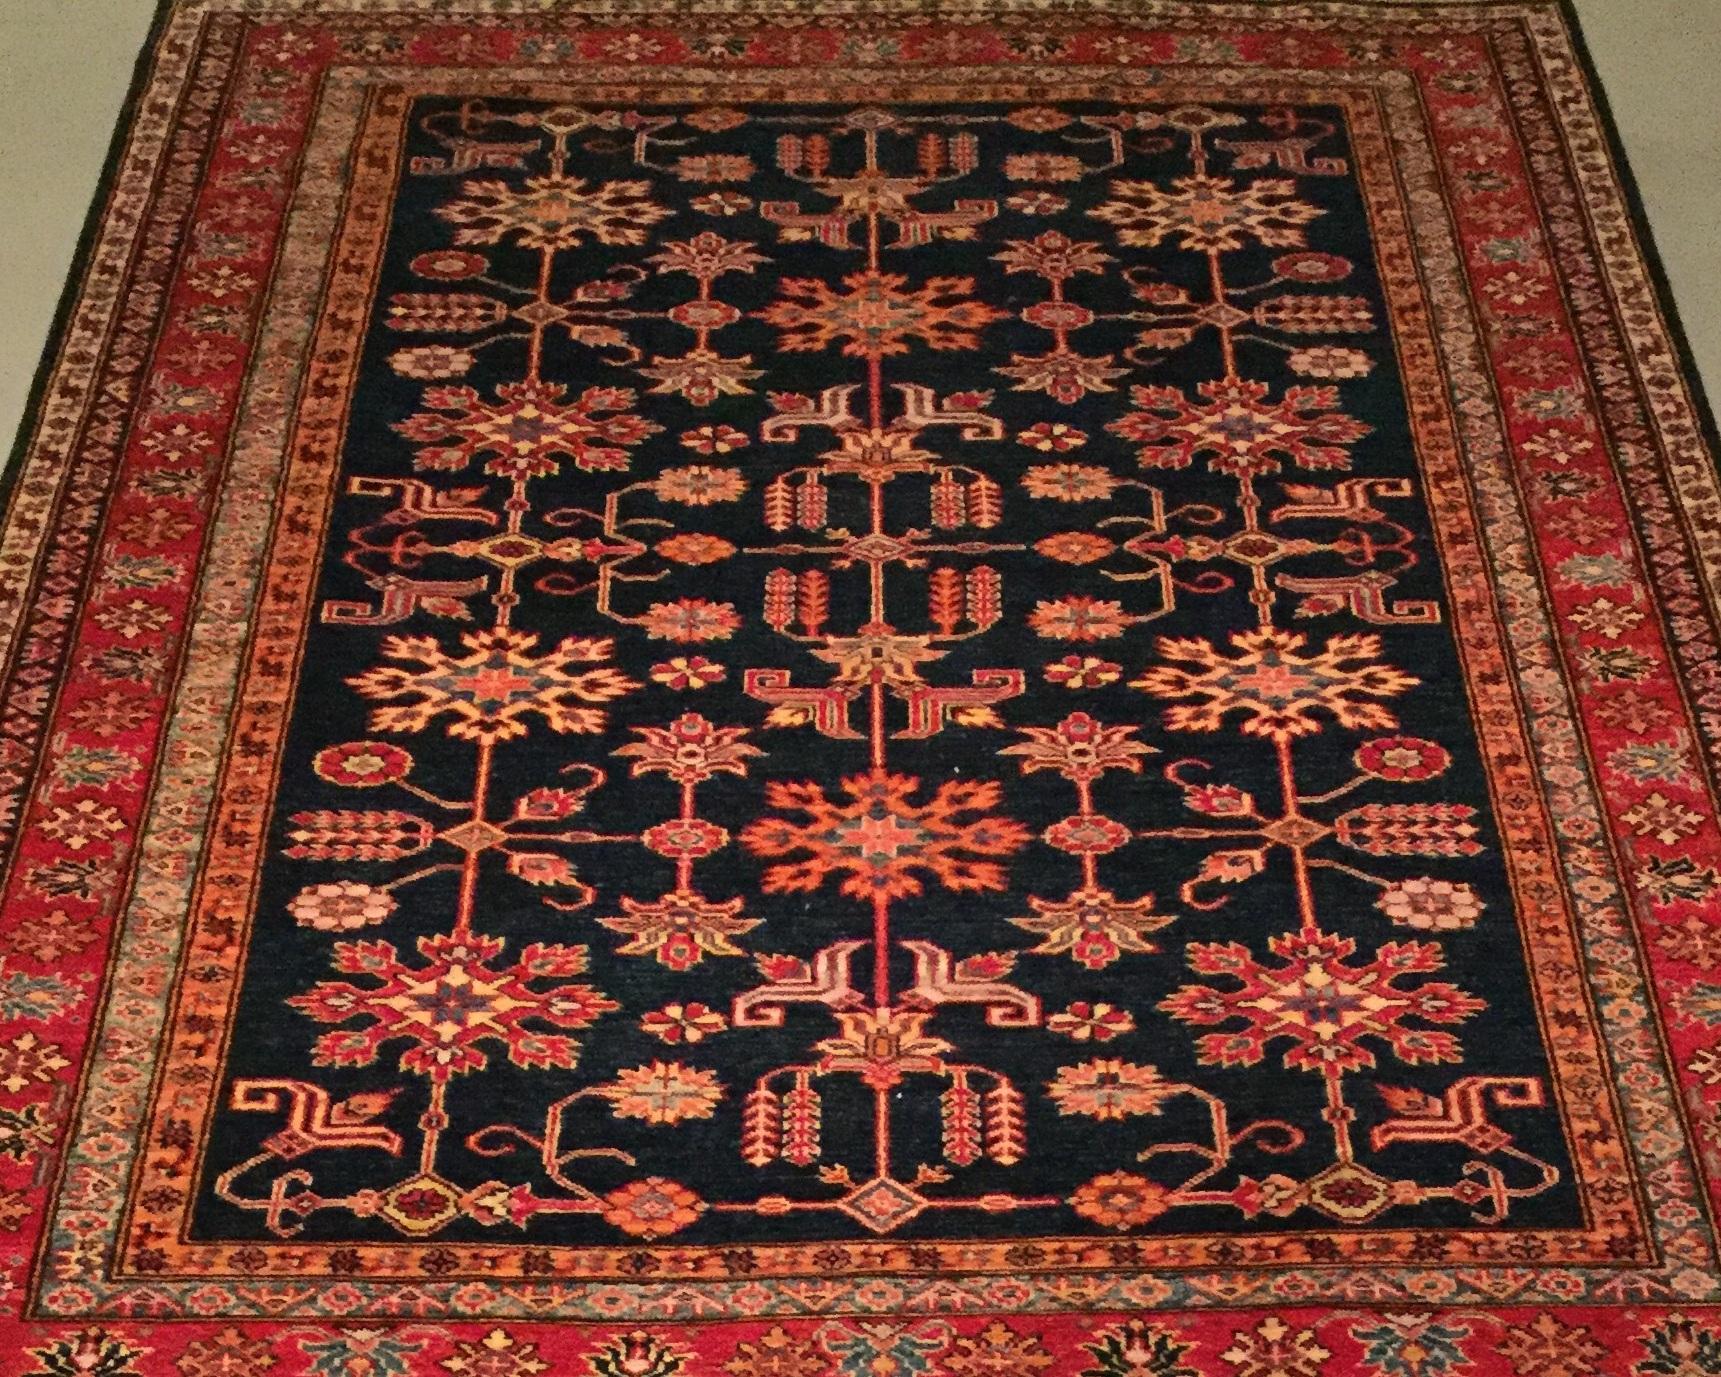 Afghan Kazak - Circa 2000'sSize Measurements: 233cm x 179cm